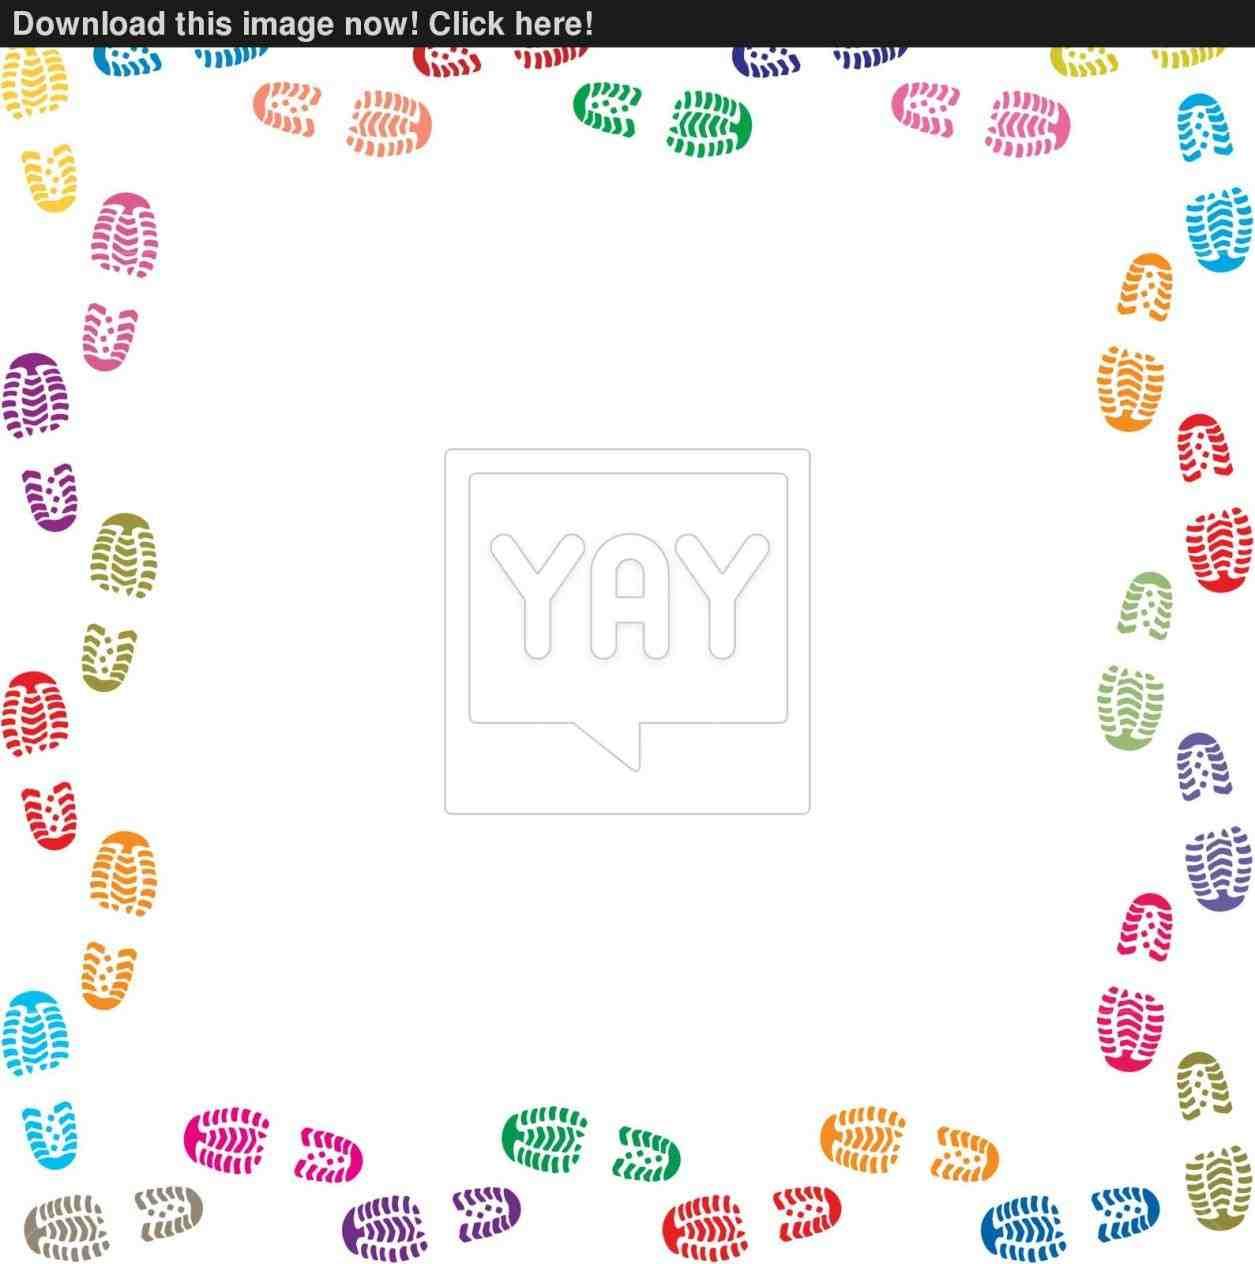 Tennis shoe border clipart vector Shoes clipart borders - 63 transparent clip arts, images and ... vector